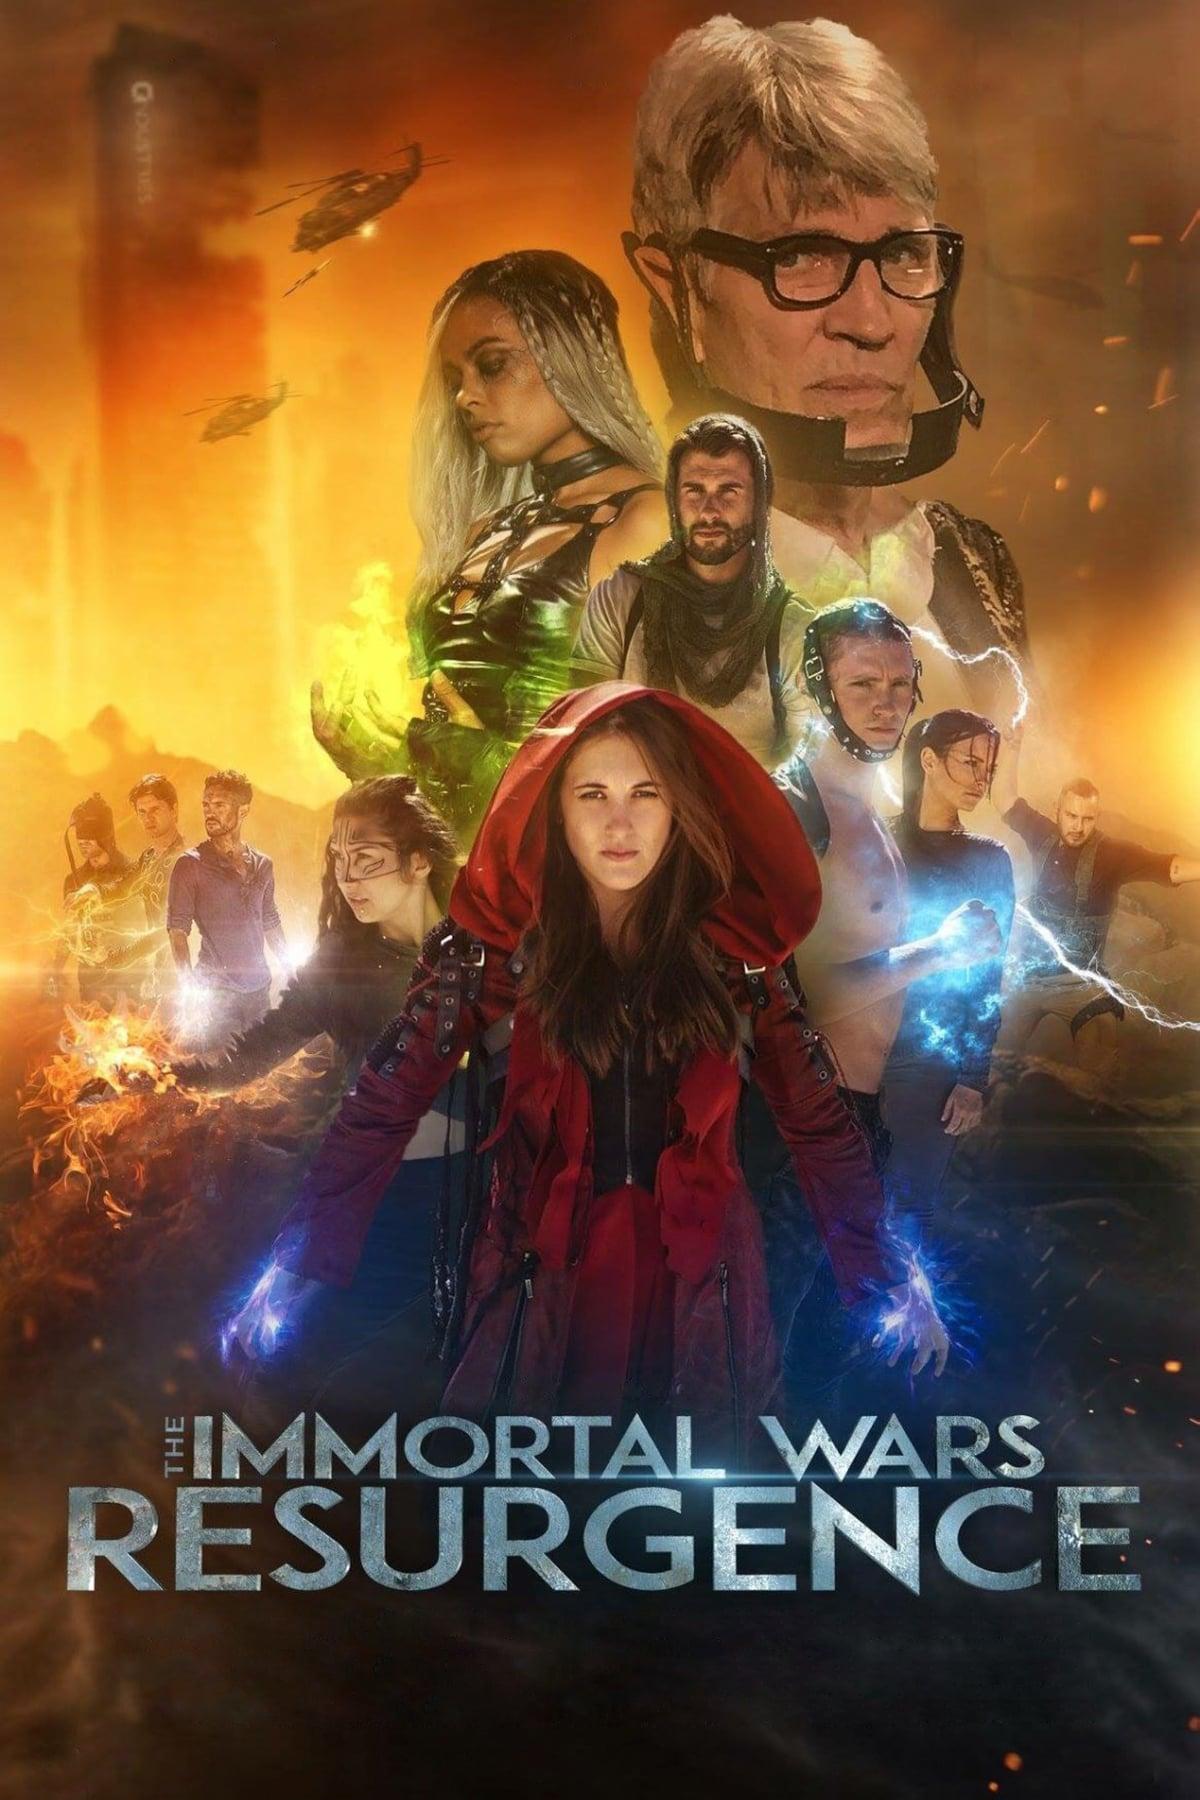 Watch The Immortal Wars: Resurgence Online